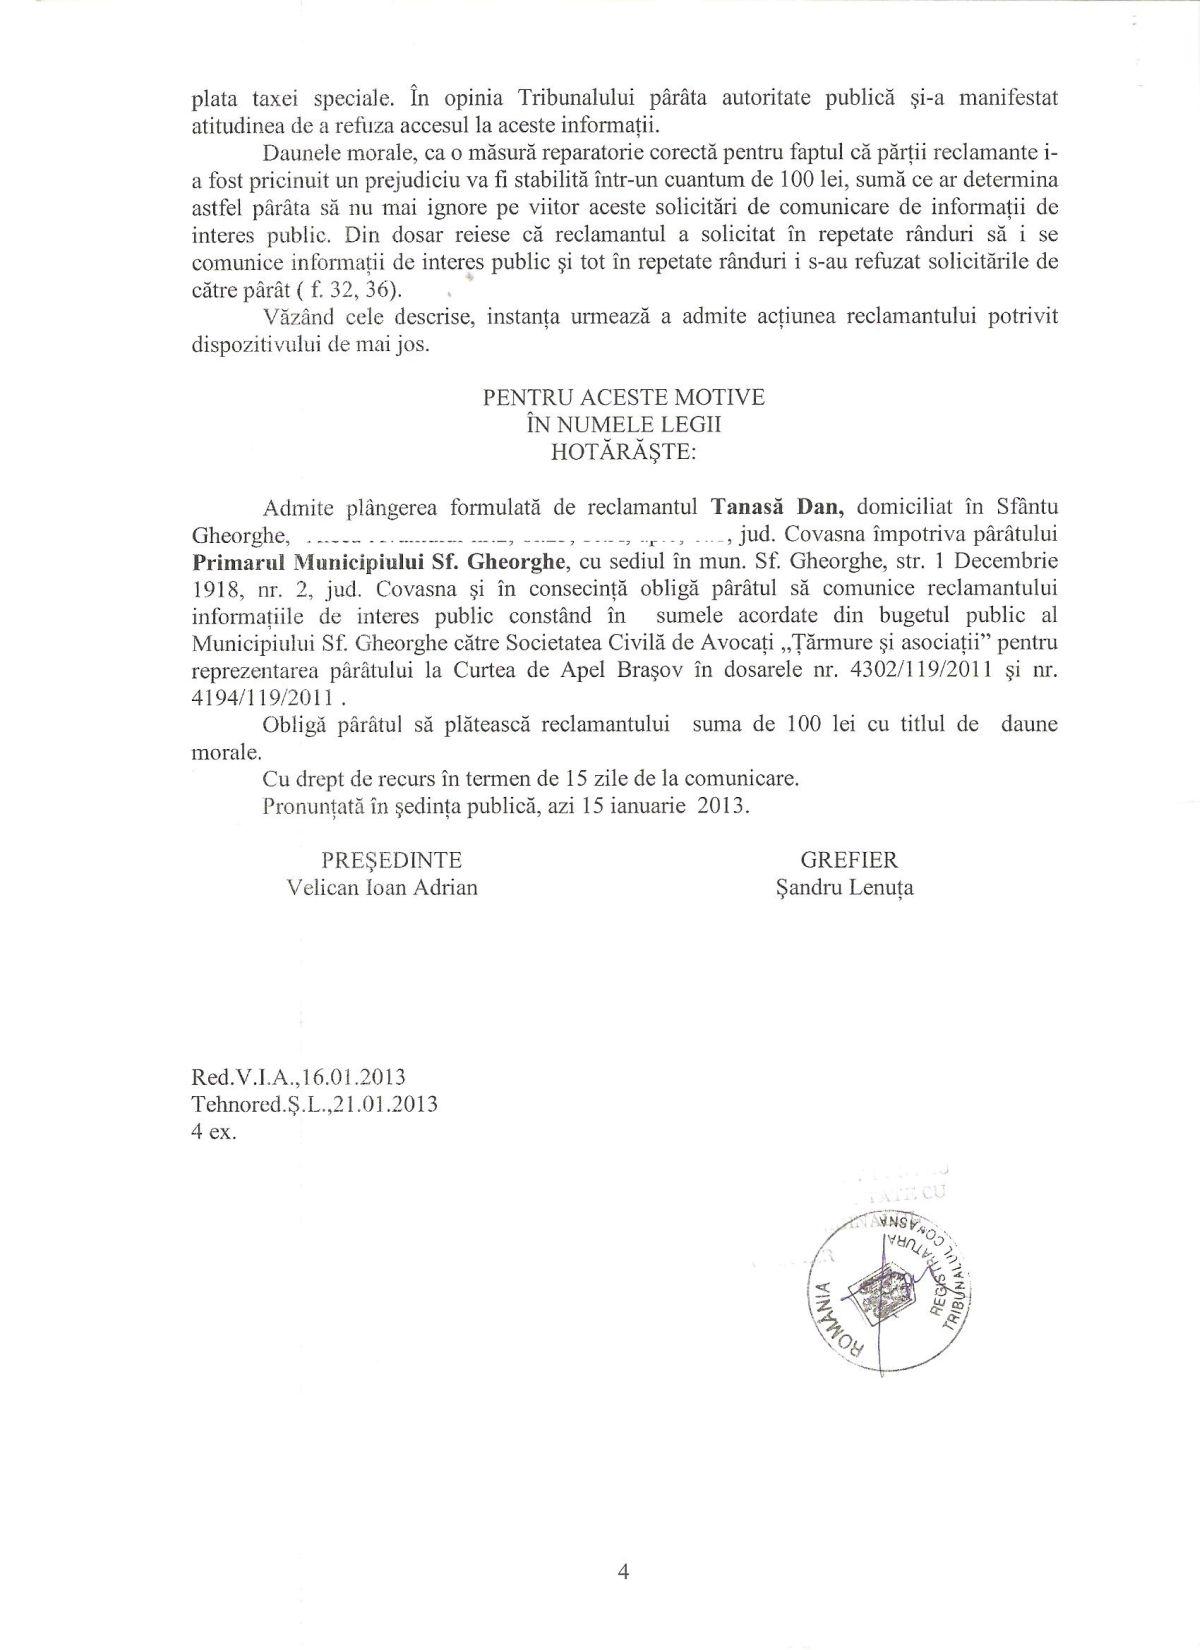 Sentinta Tribunal Covasna Primar Sfantu Gheorghe Legea 544/2001 Dan Tanasa